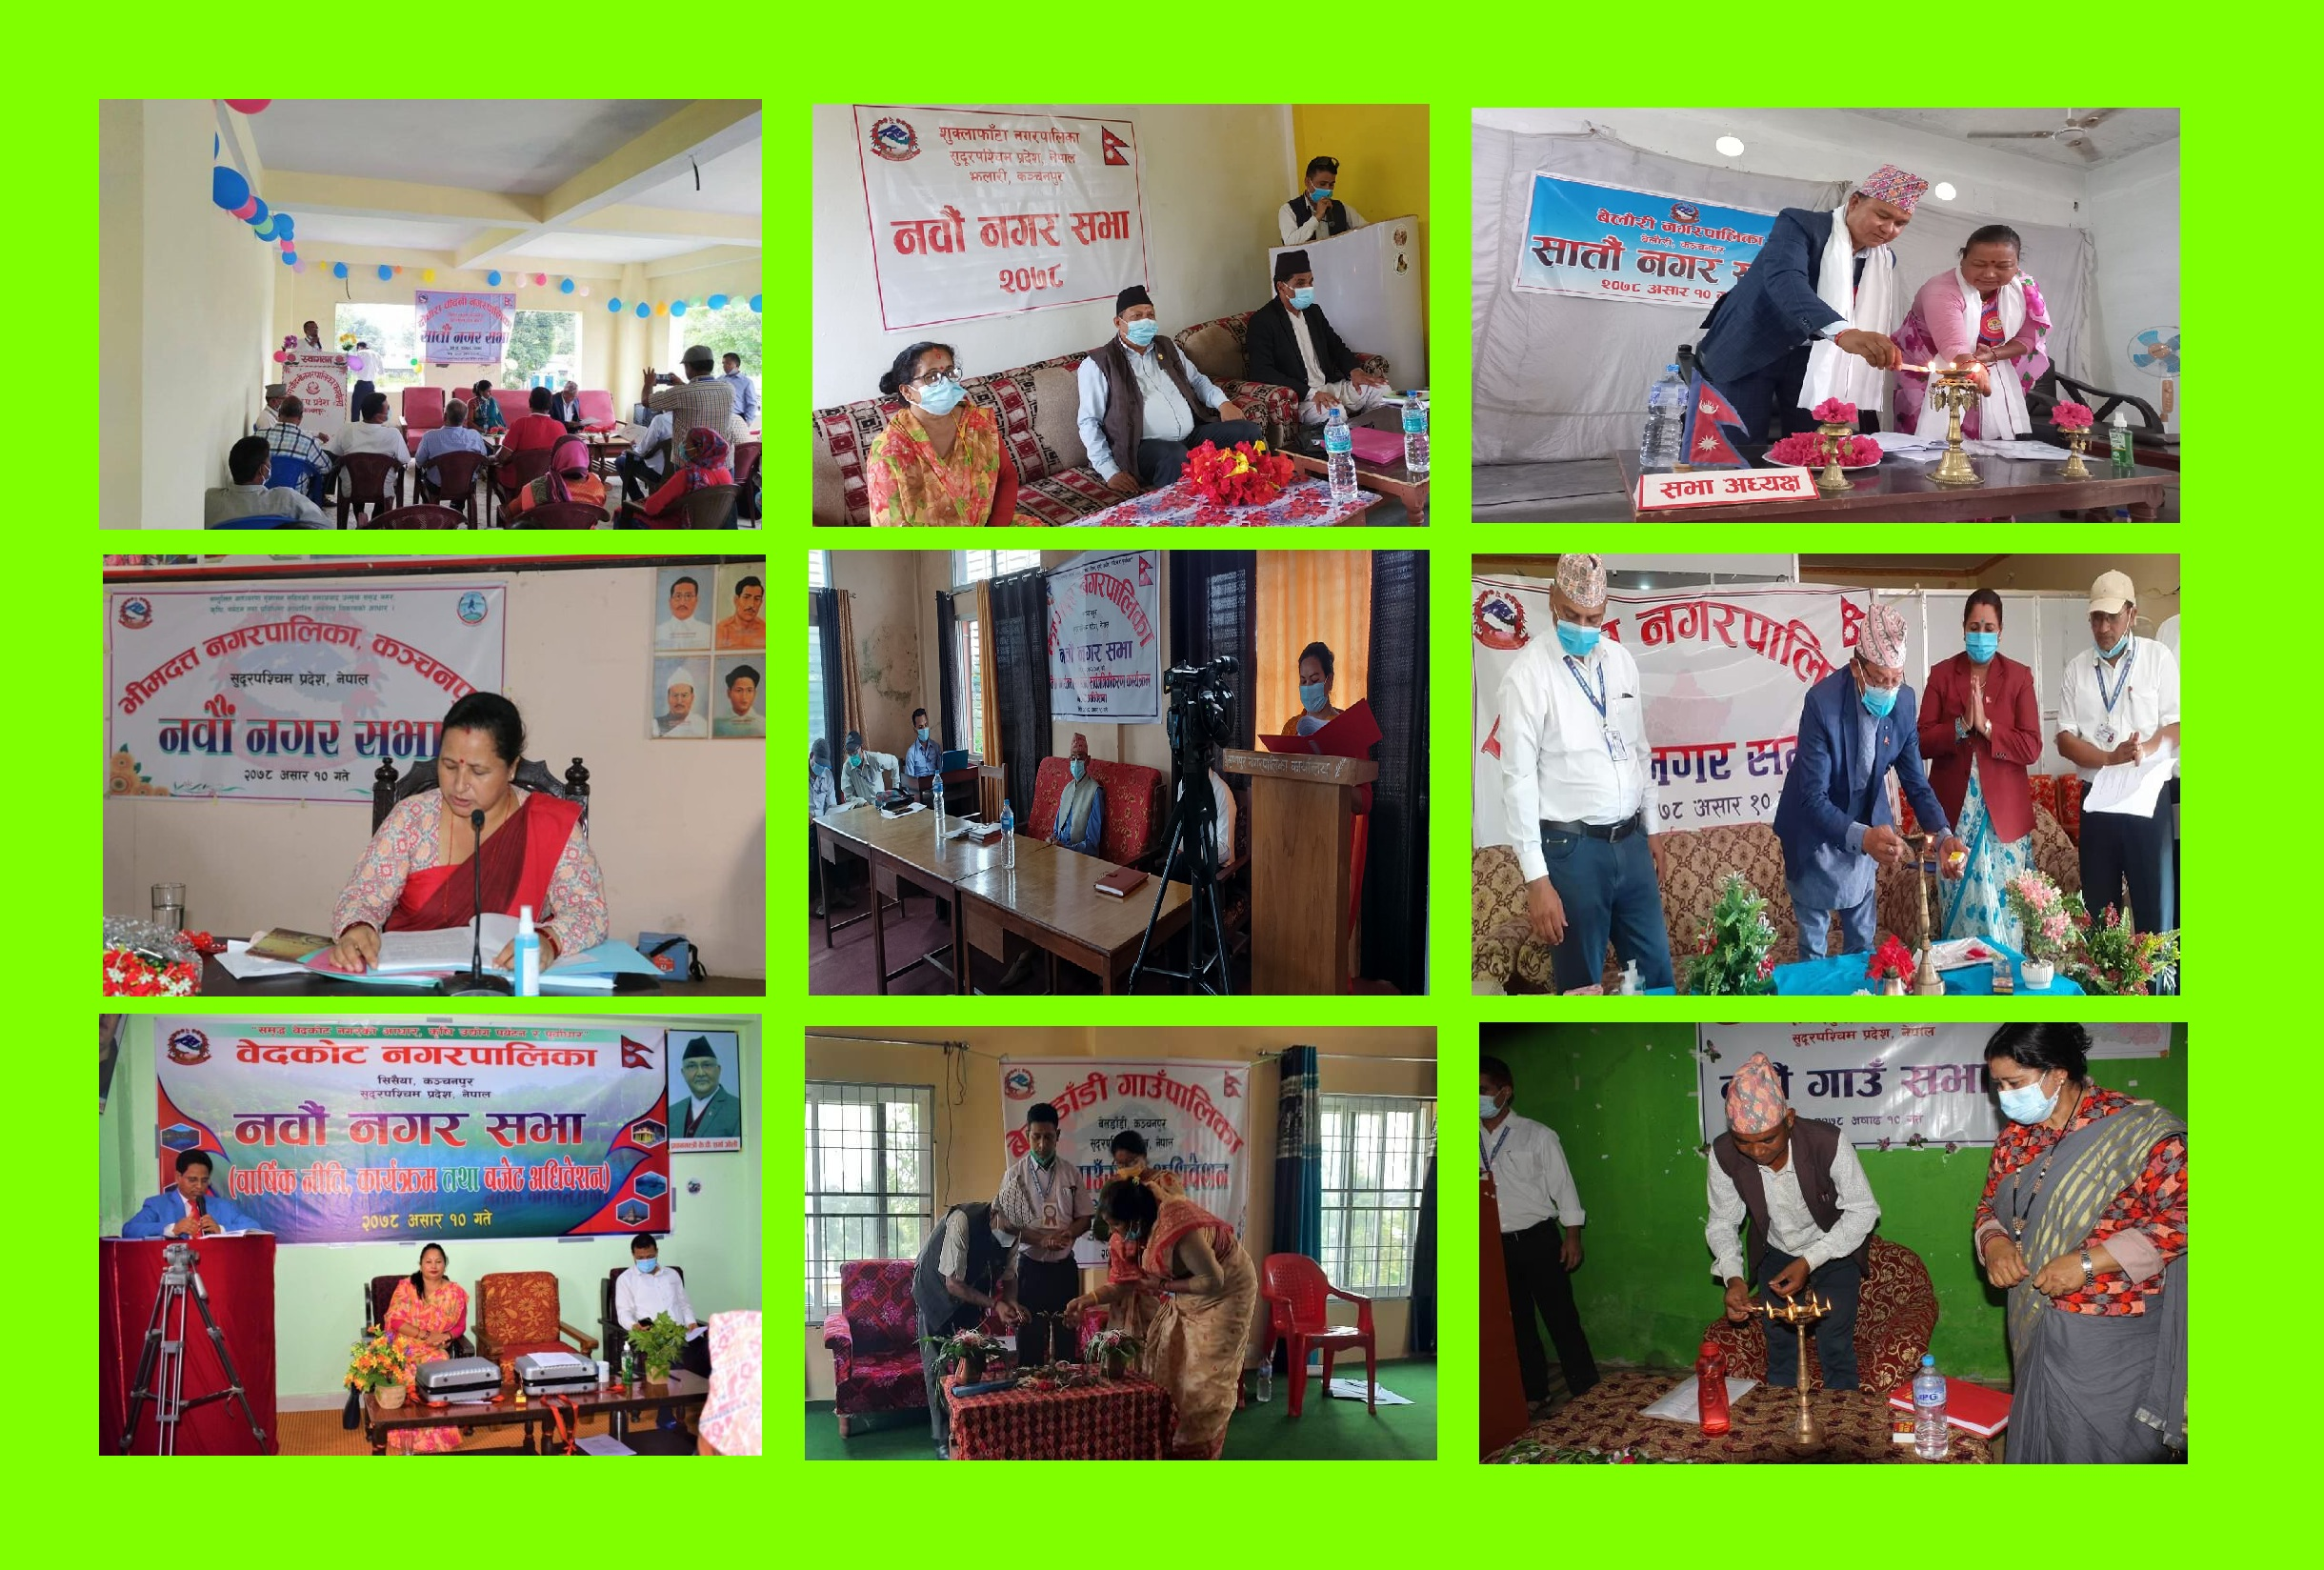 कञ्चनपुरका ९ वटै स्थानीय तहहरूद्वारा नीति तथा कार्यक्रम सार्वजनिक, कस्काे बजेट कति